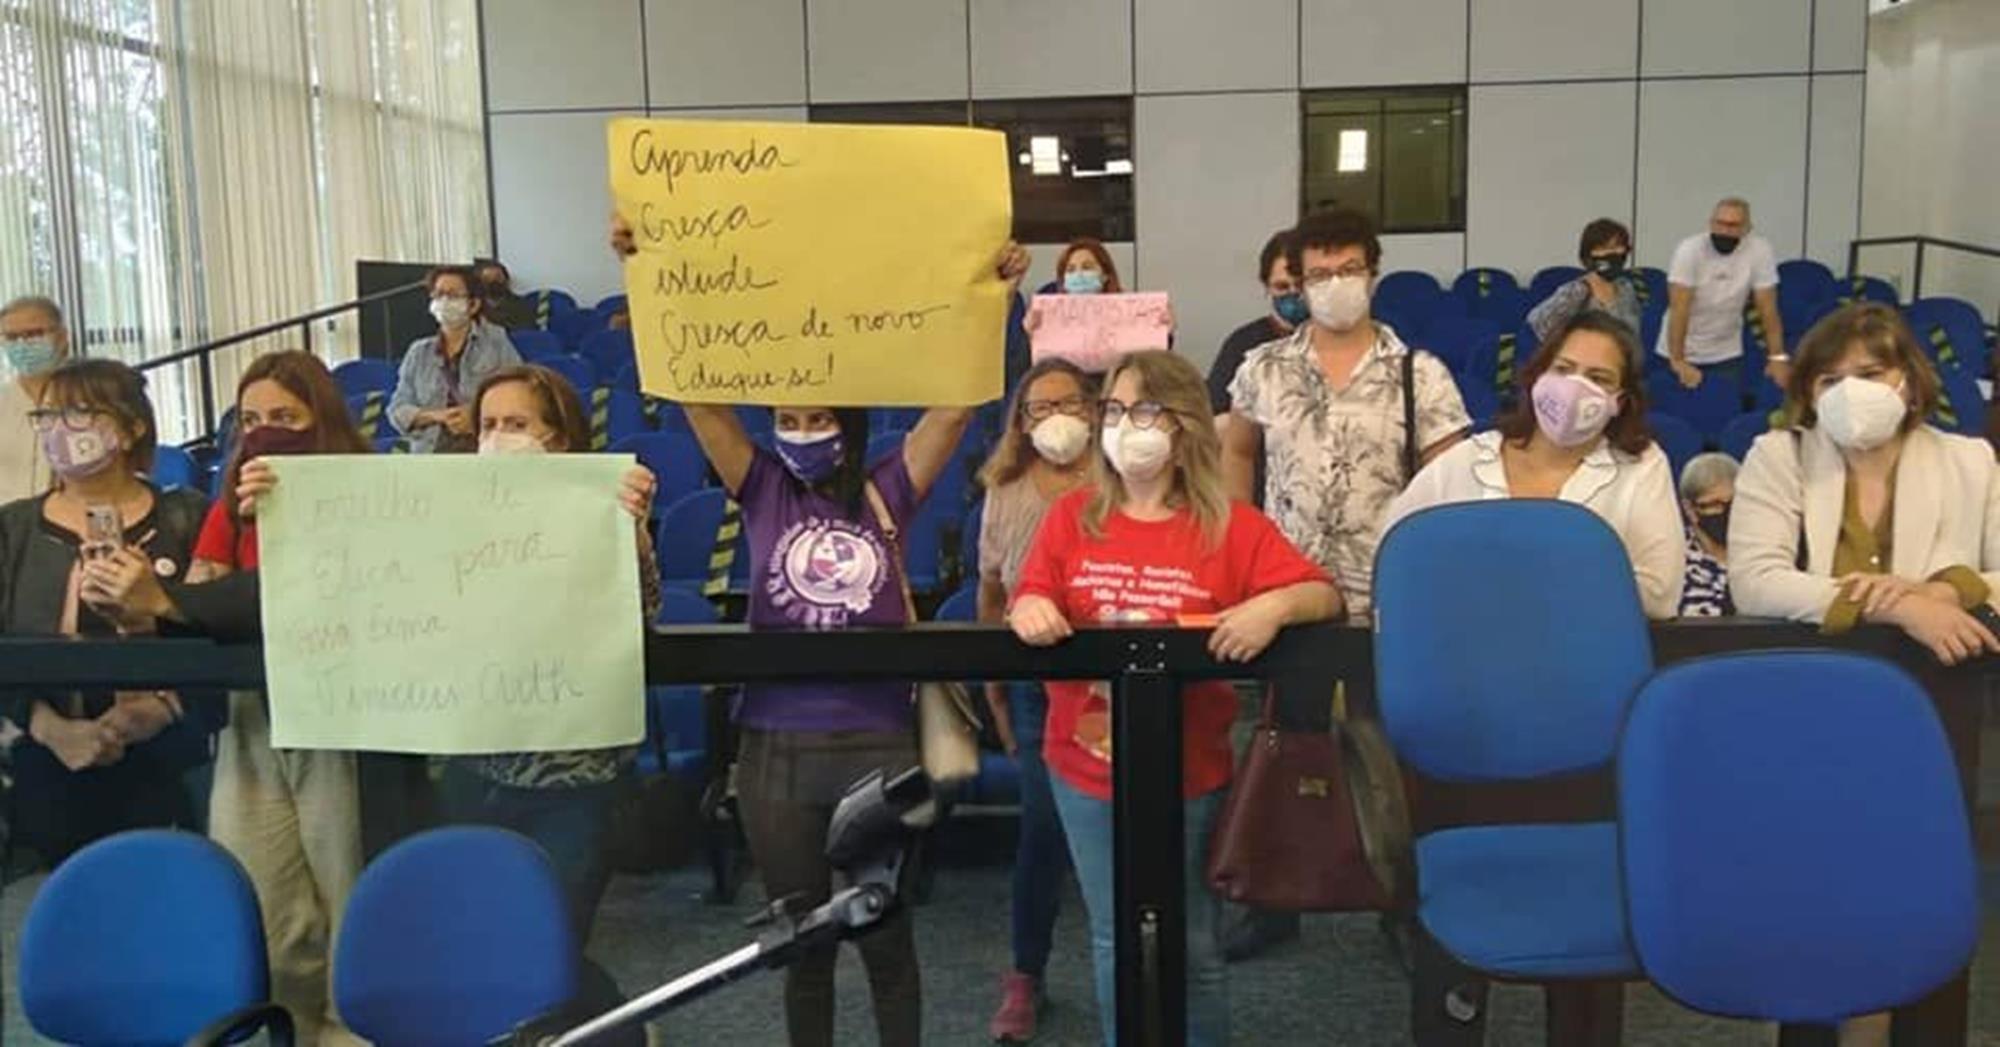 mulheres, protesto, camarasorocaba, camaradesorocaba, iarabernardi, fernandagarcia, mulheres, Divulgação/Iara Bernardi